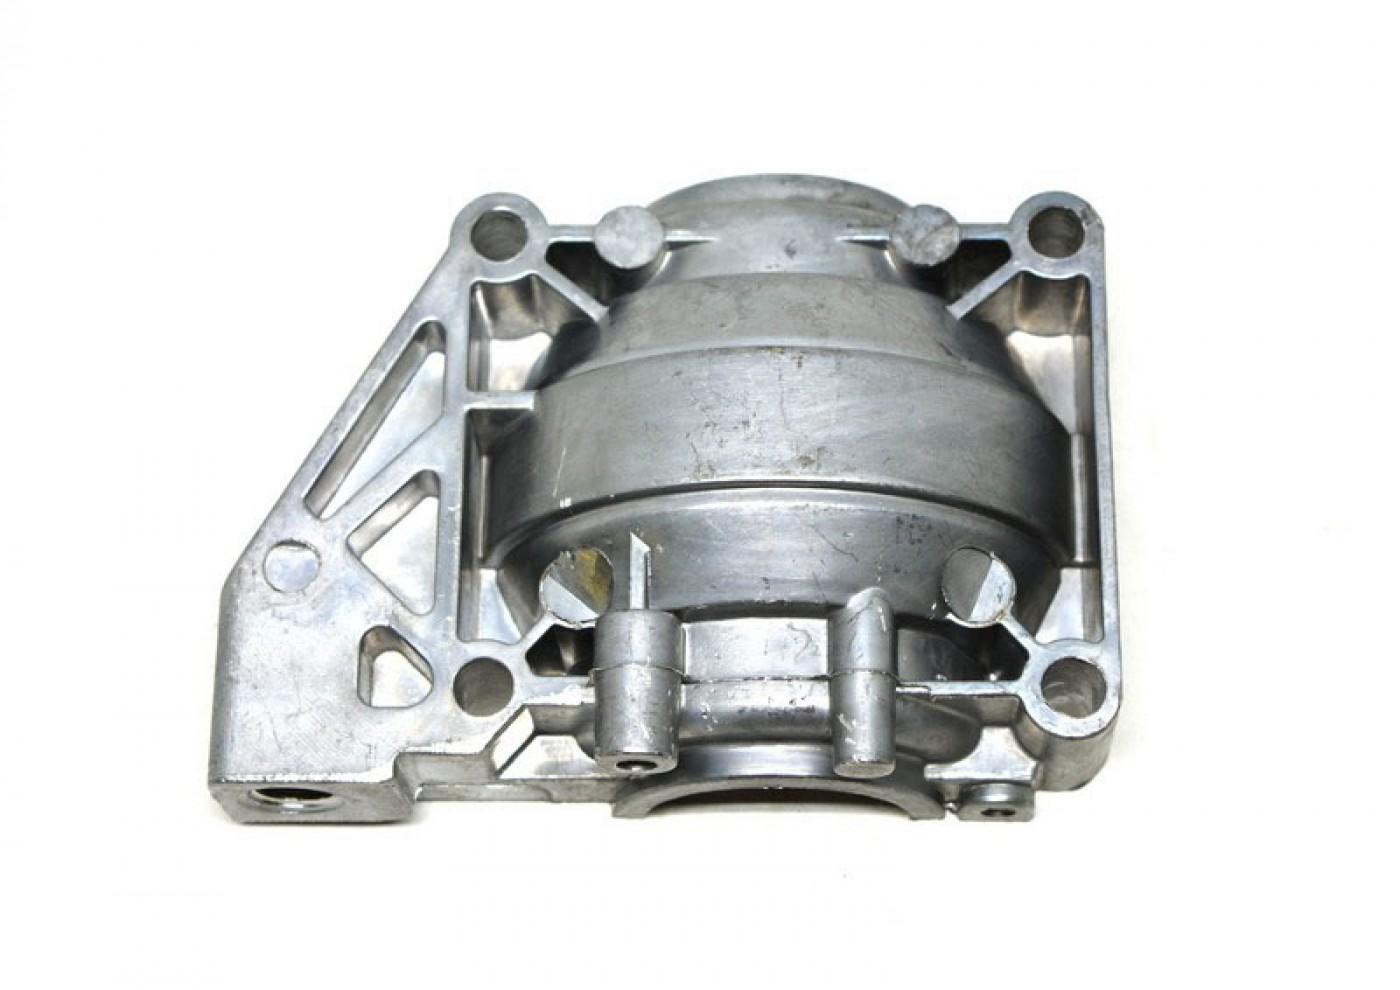 Spodný kryt motora Stihl MS290 MS310 MS390